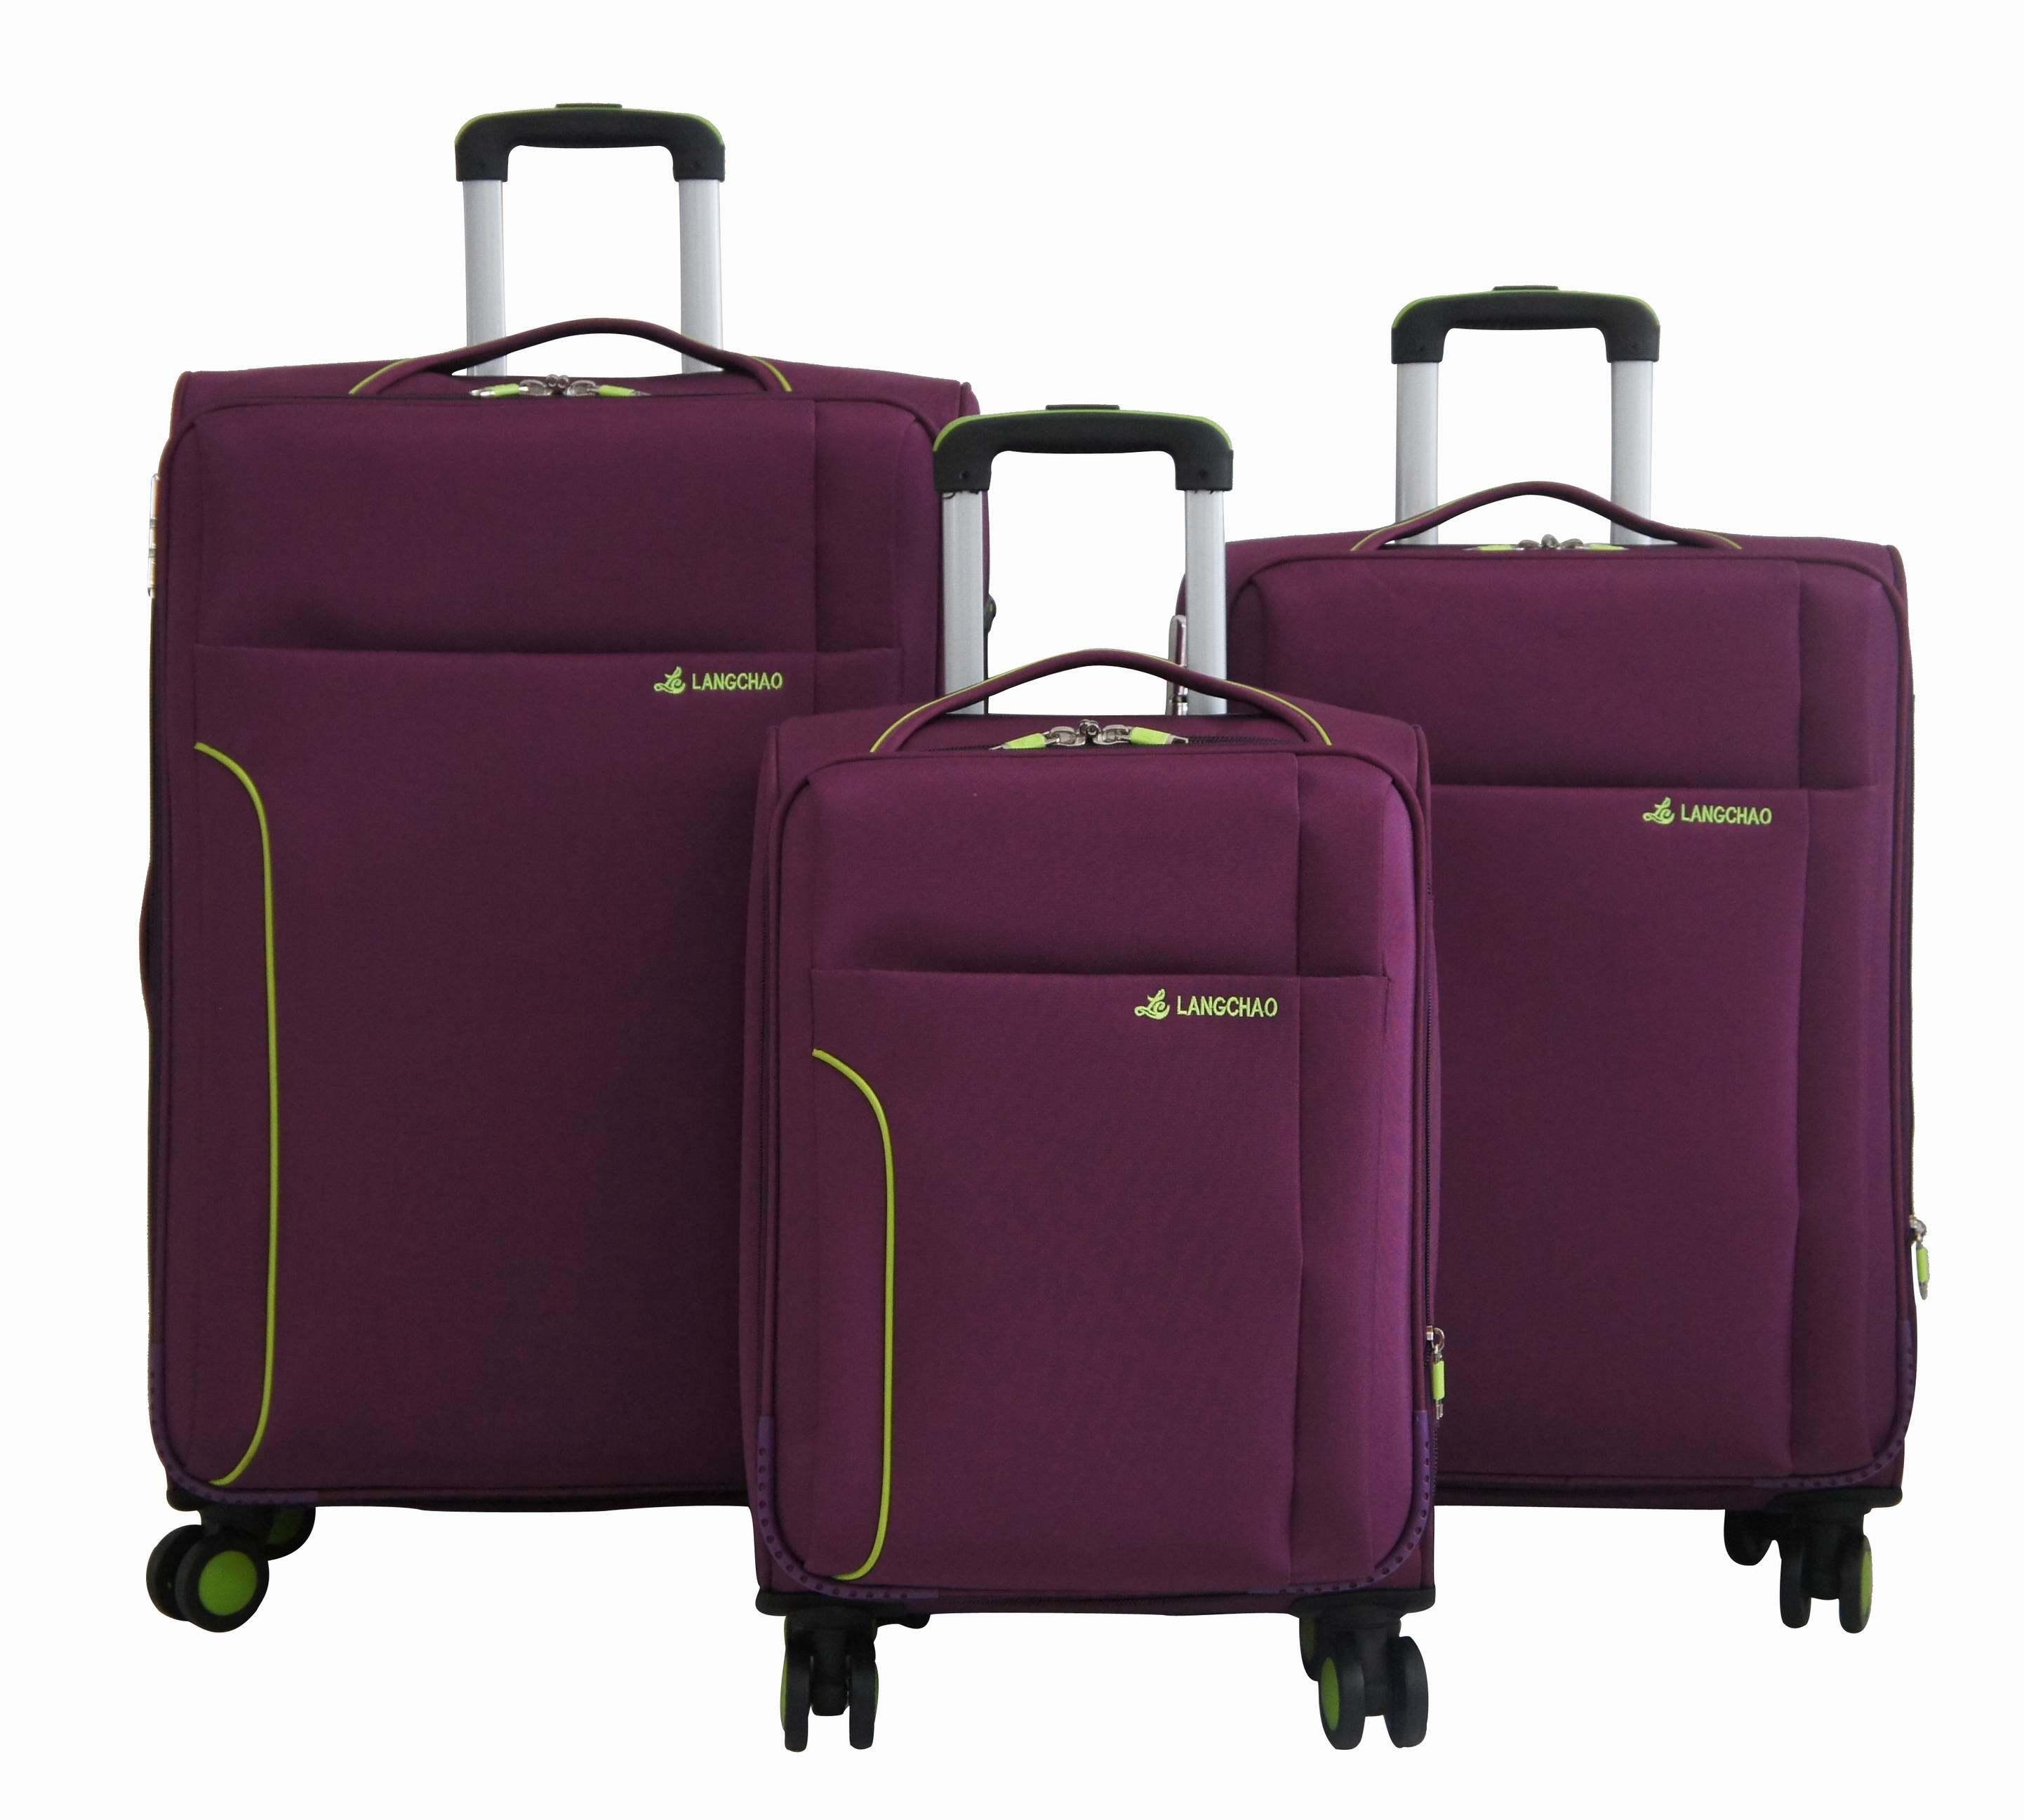 Fabric Soft Trolley Bag Luggage Set Suitcase 1jb012